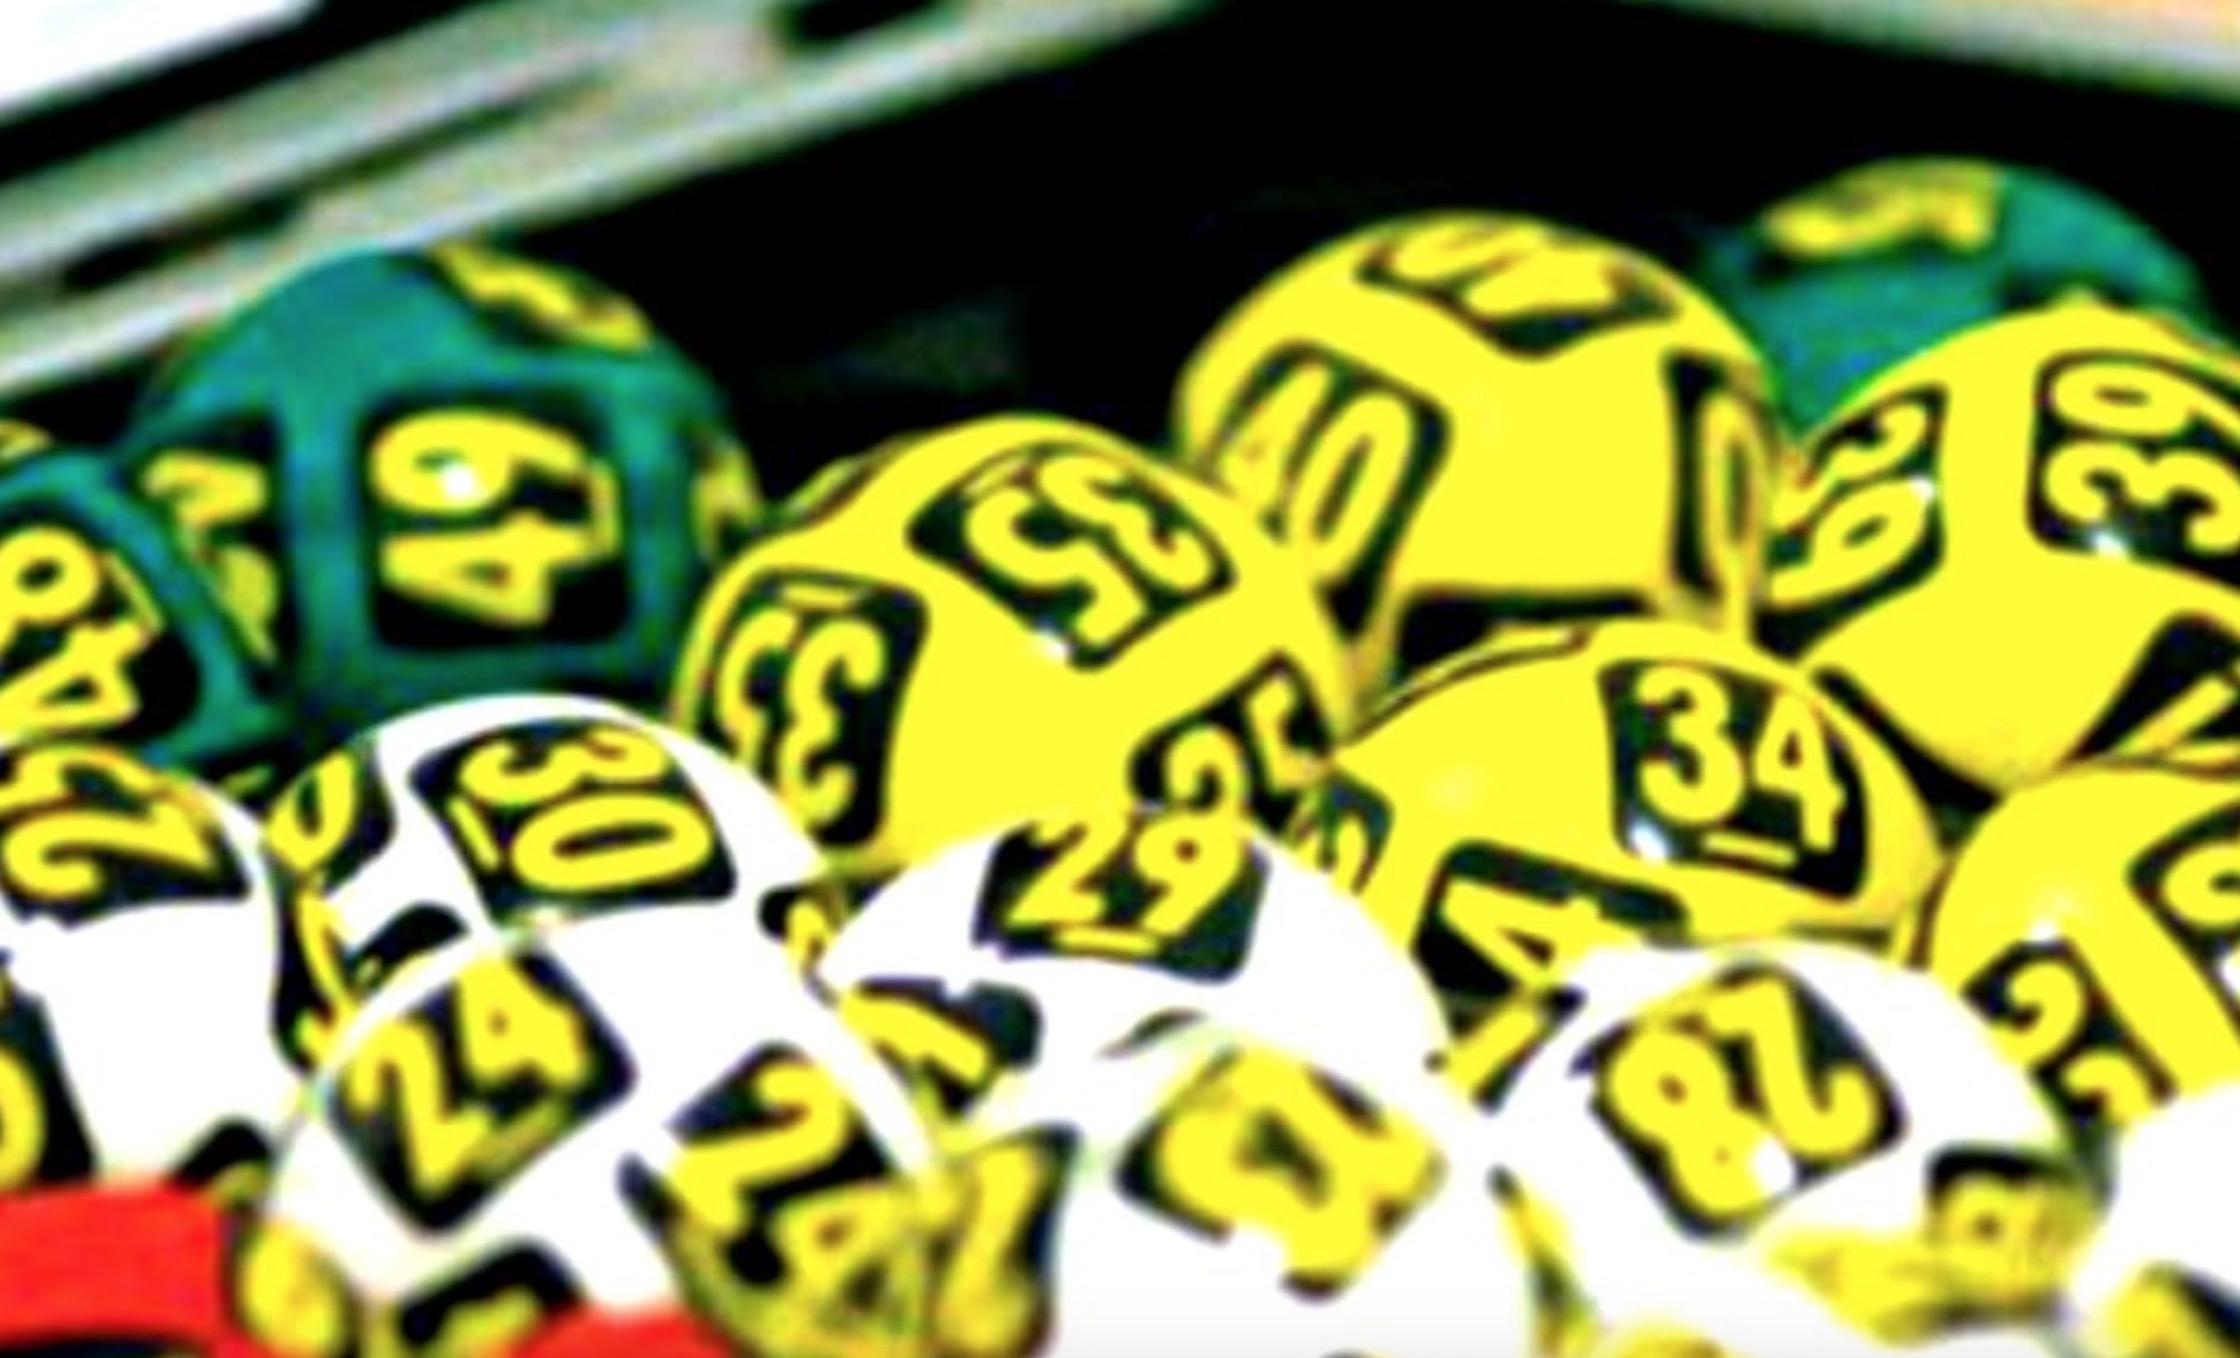 Rezultate Loto 6/49, 5/40, Joker numere extrase 5 martie 2020, premii suplimentate